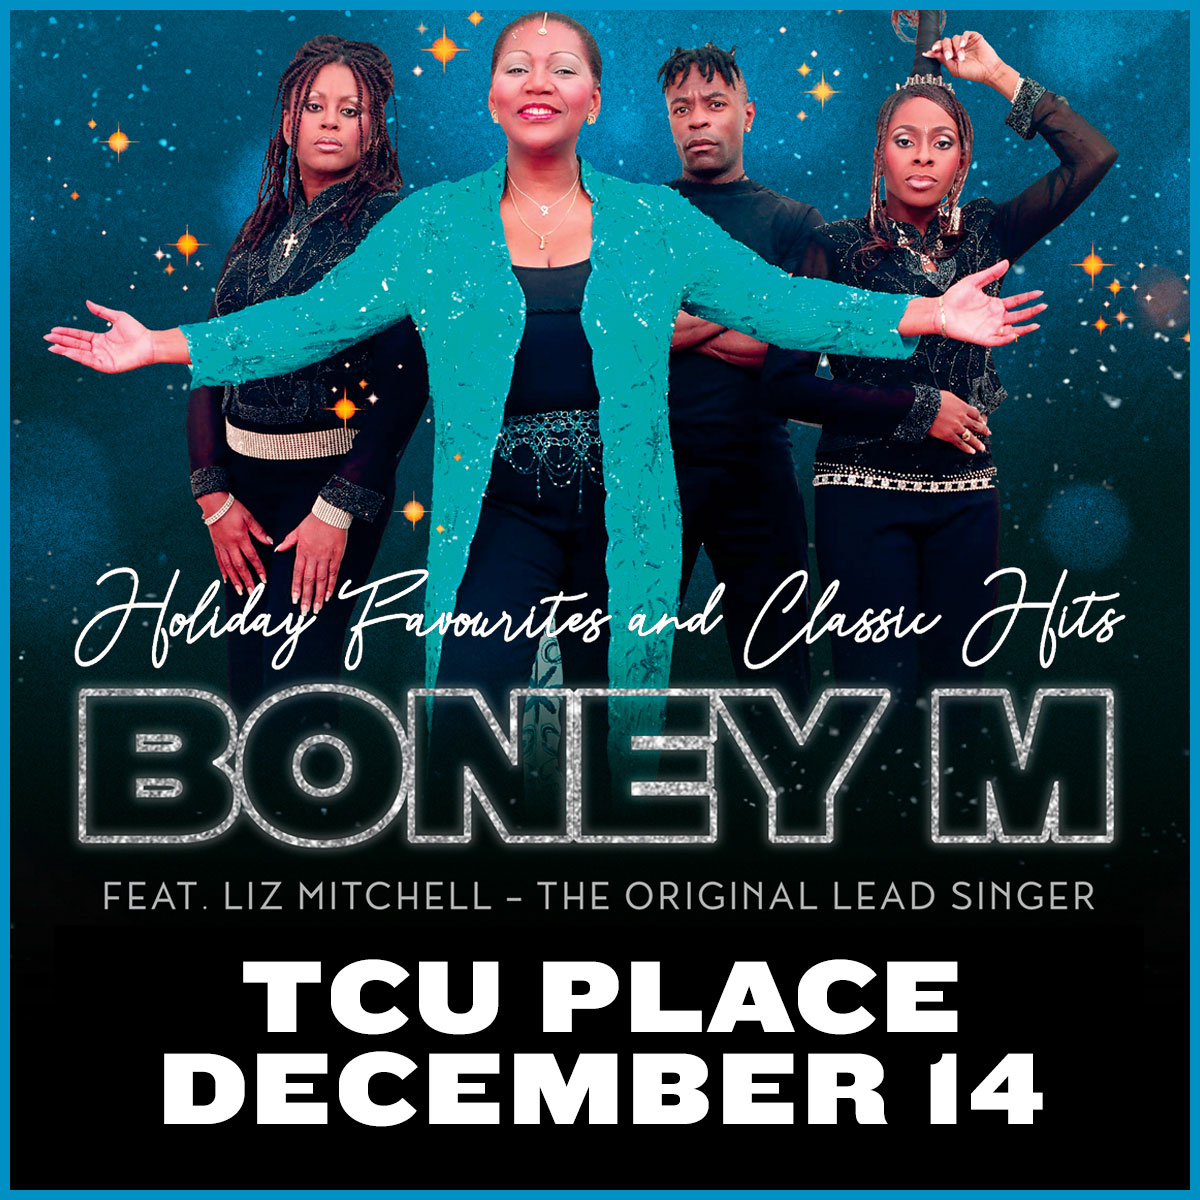 Boney M Christmas Album.Boney M 2019